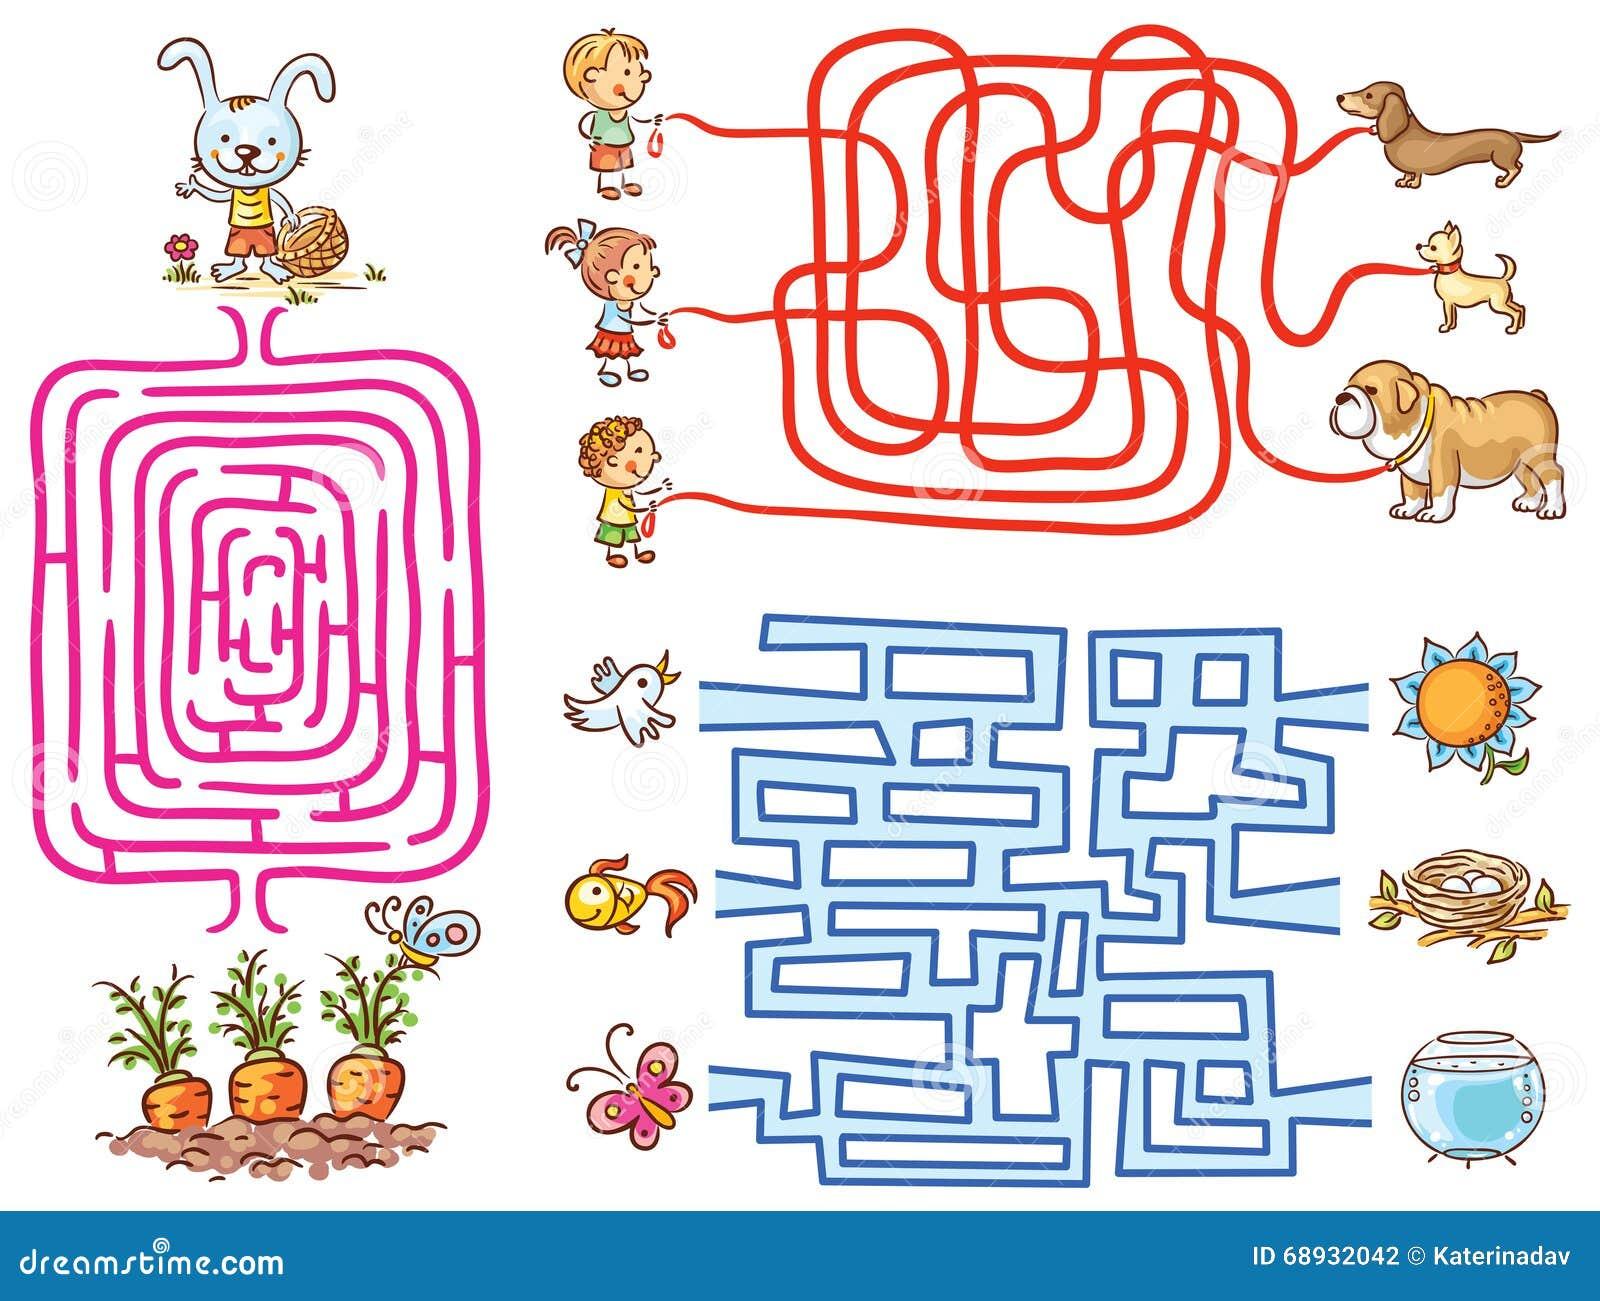 jogos de labirintos online dating